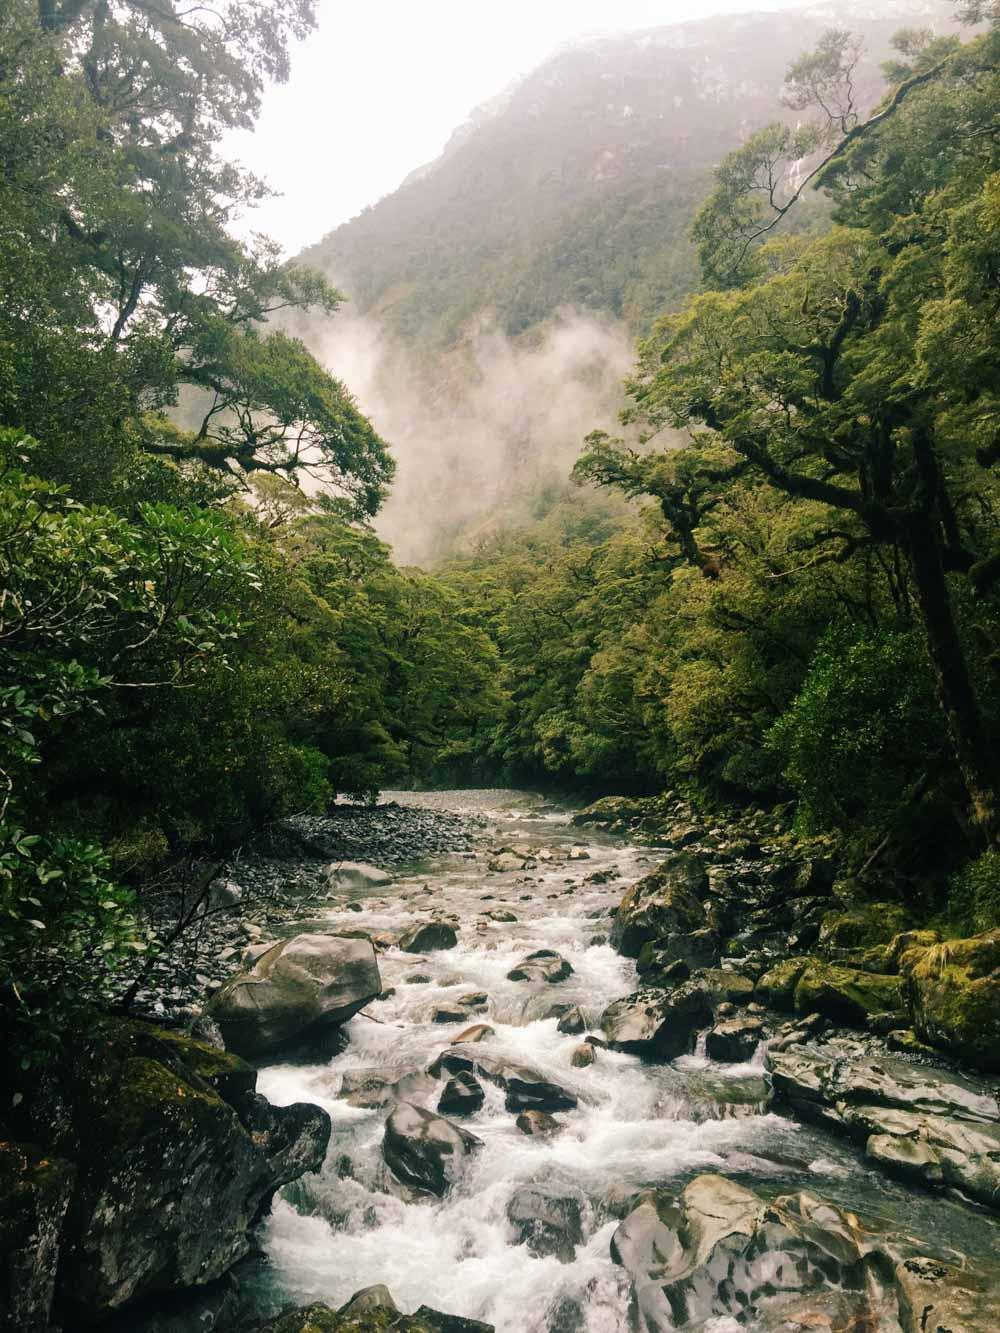 Plan a trip to New Zealand - Milford Sound